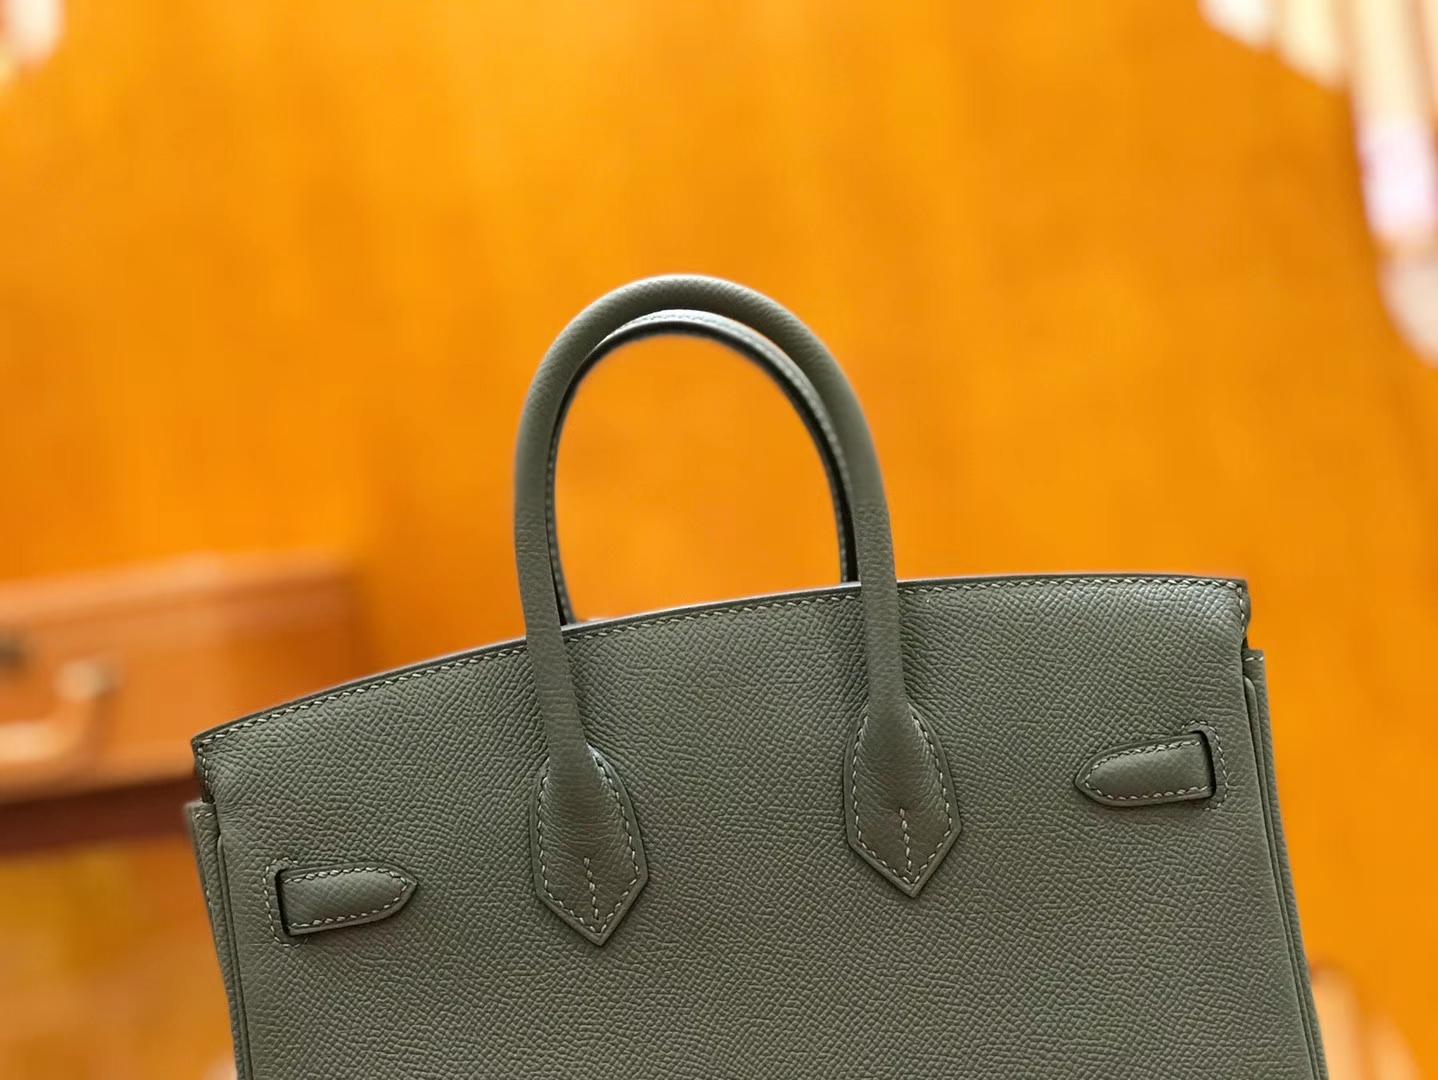 Hermès(爱马仕)Birkin 25cm 杏仁绿 金扣 掌纹牛皮 全手工缝制